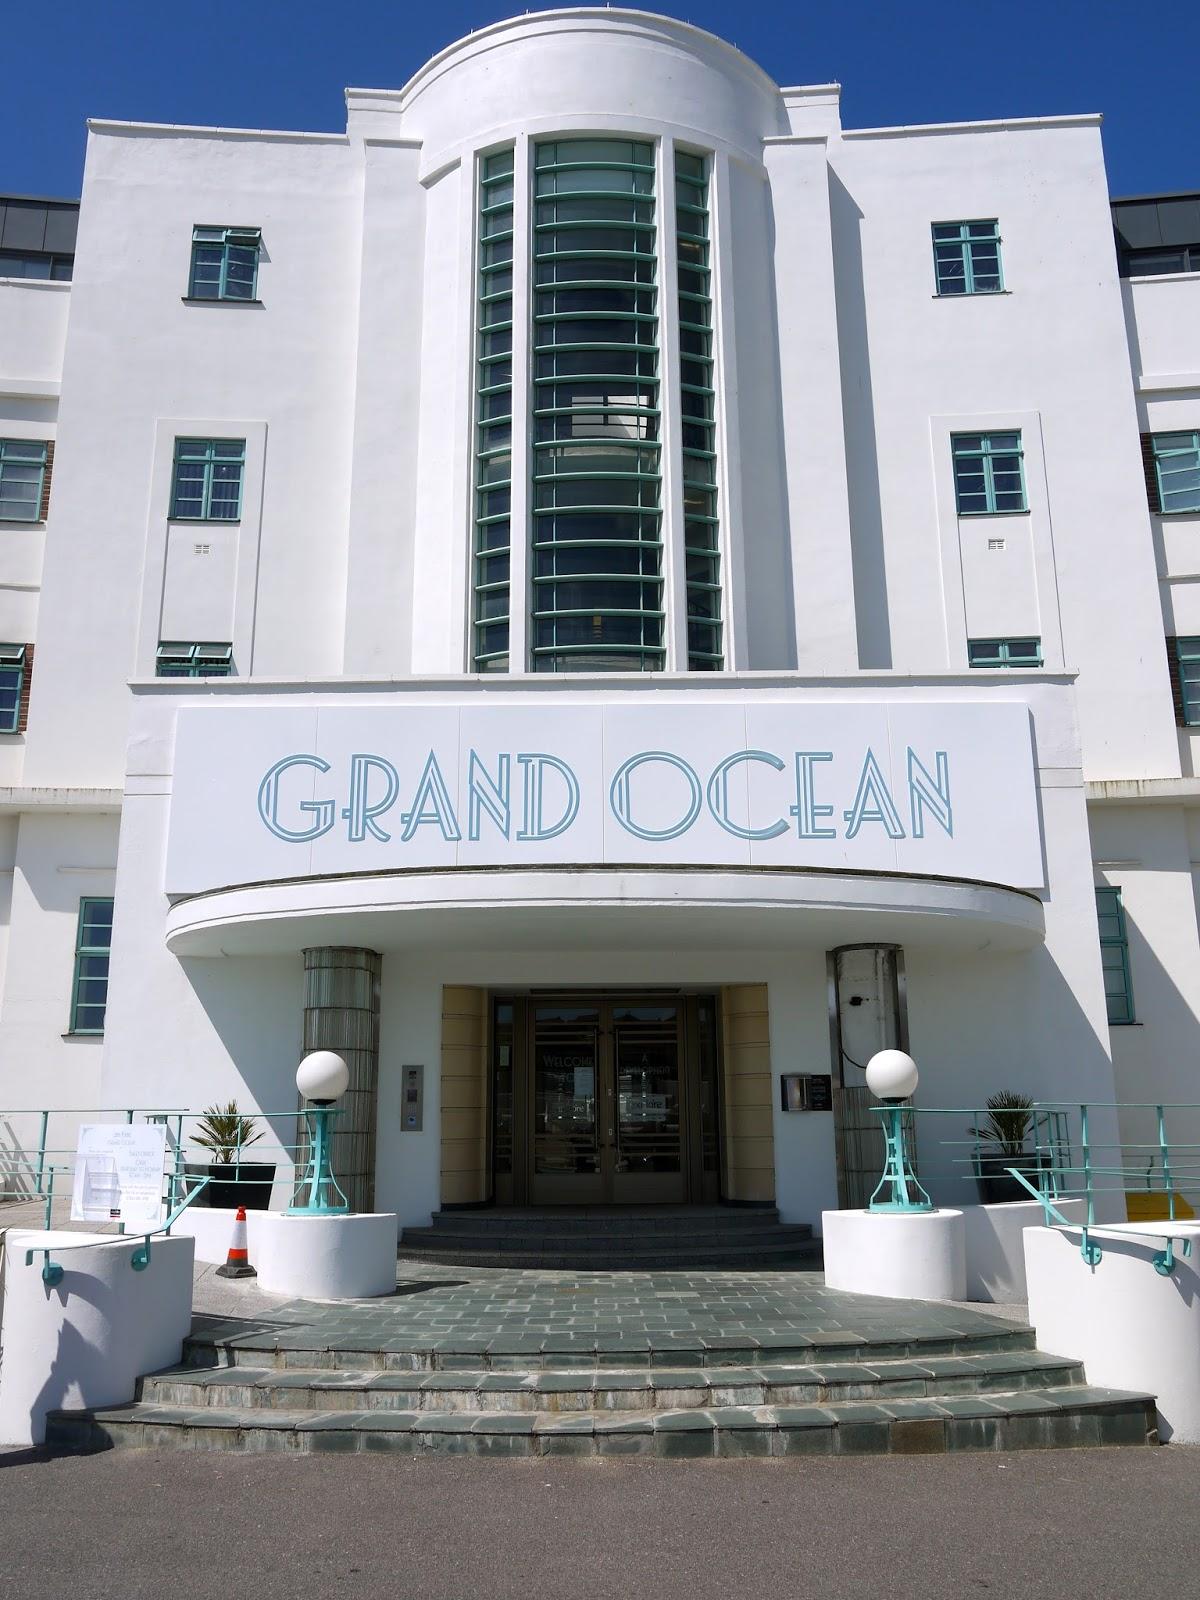 Art Deco Hotel & Suites - room photo 22450225